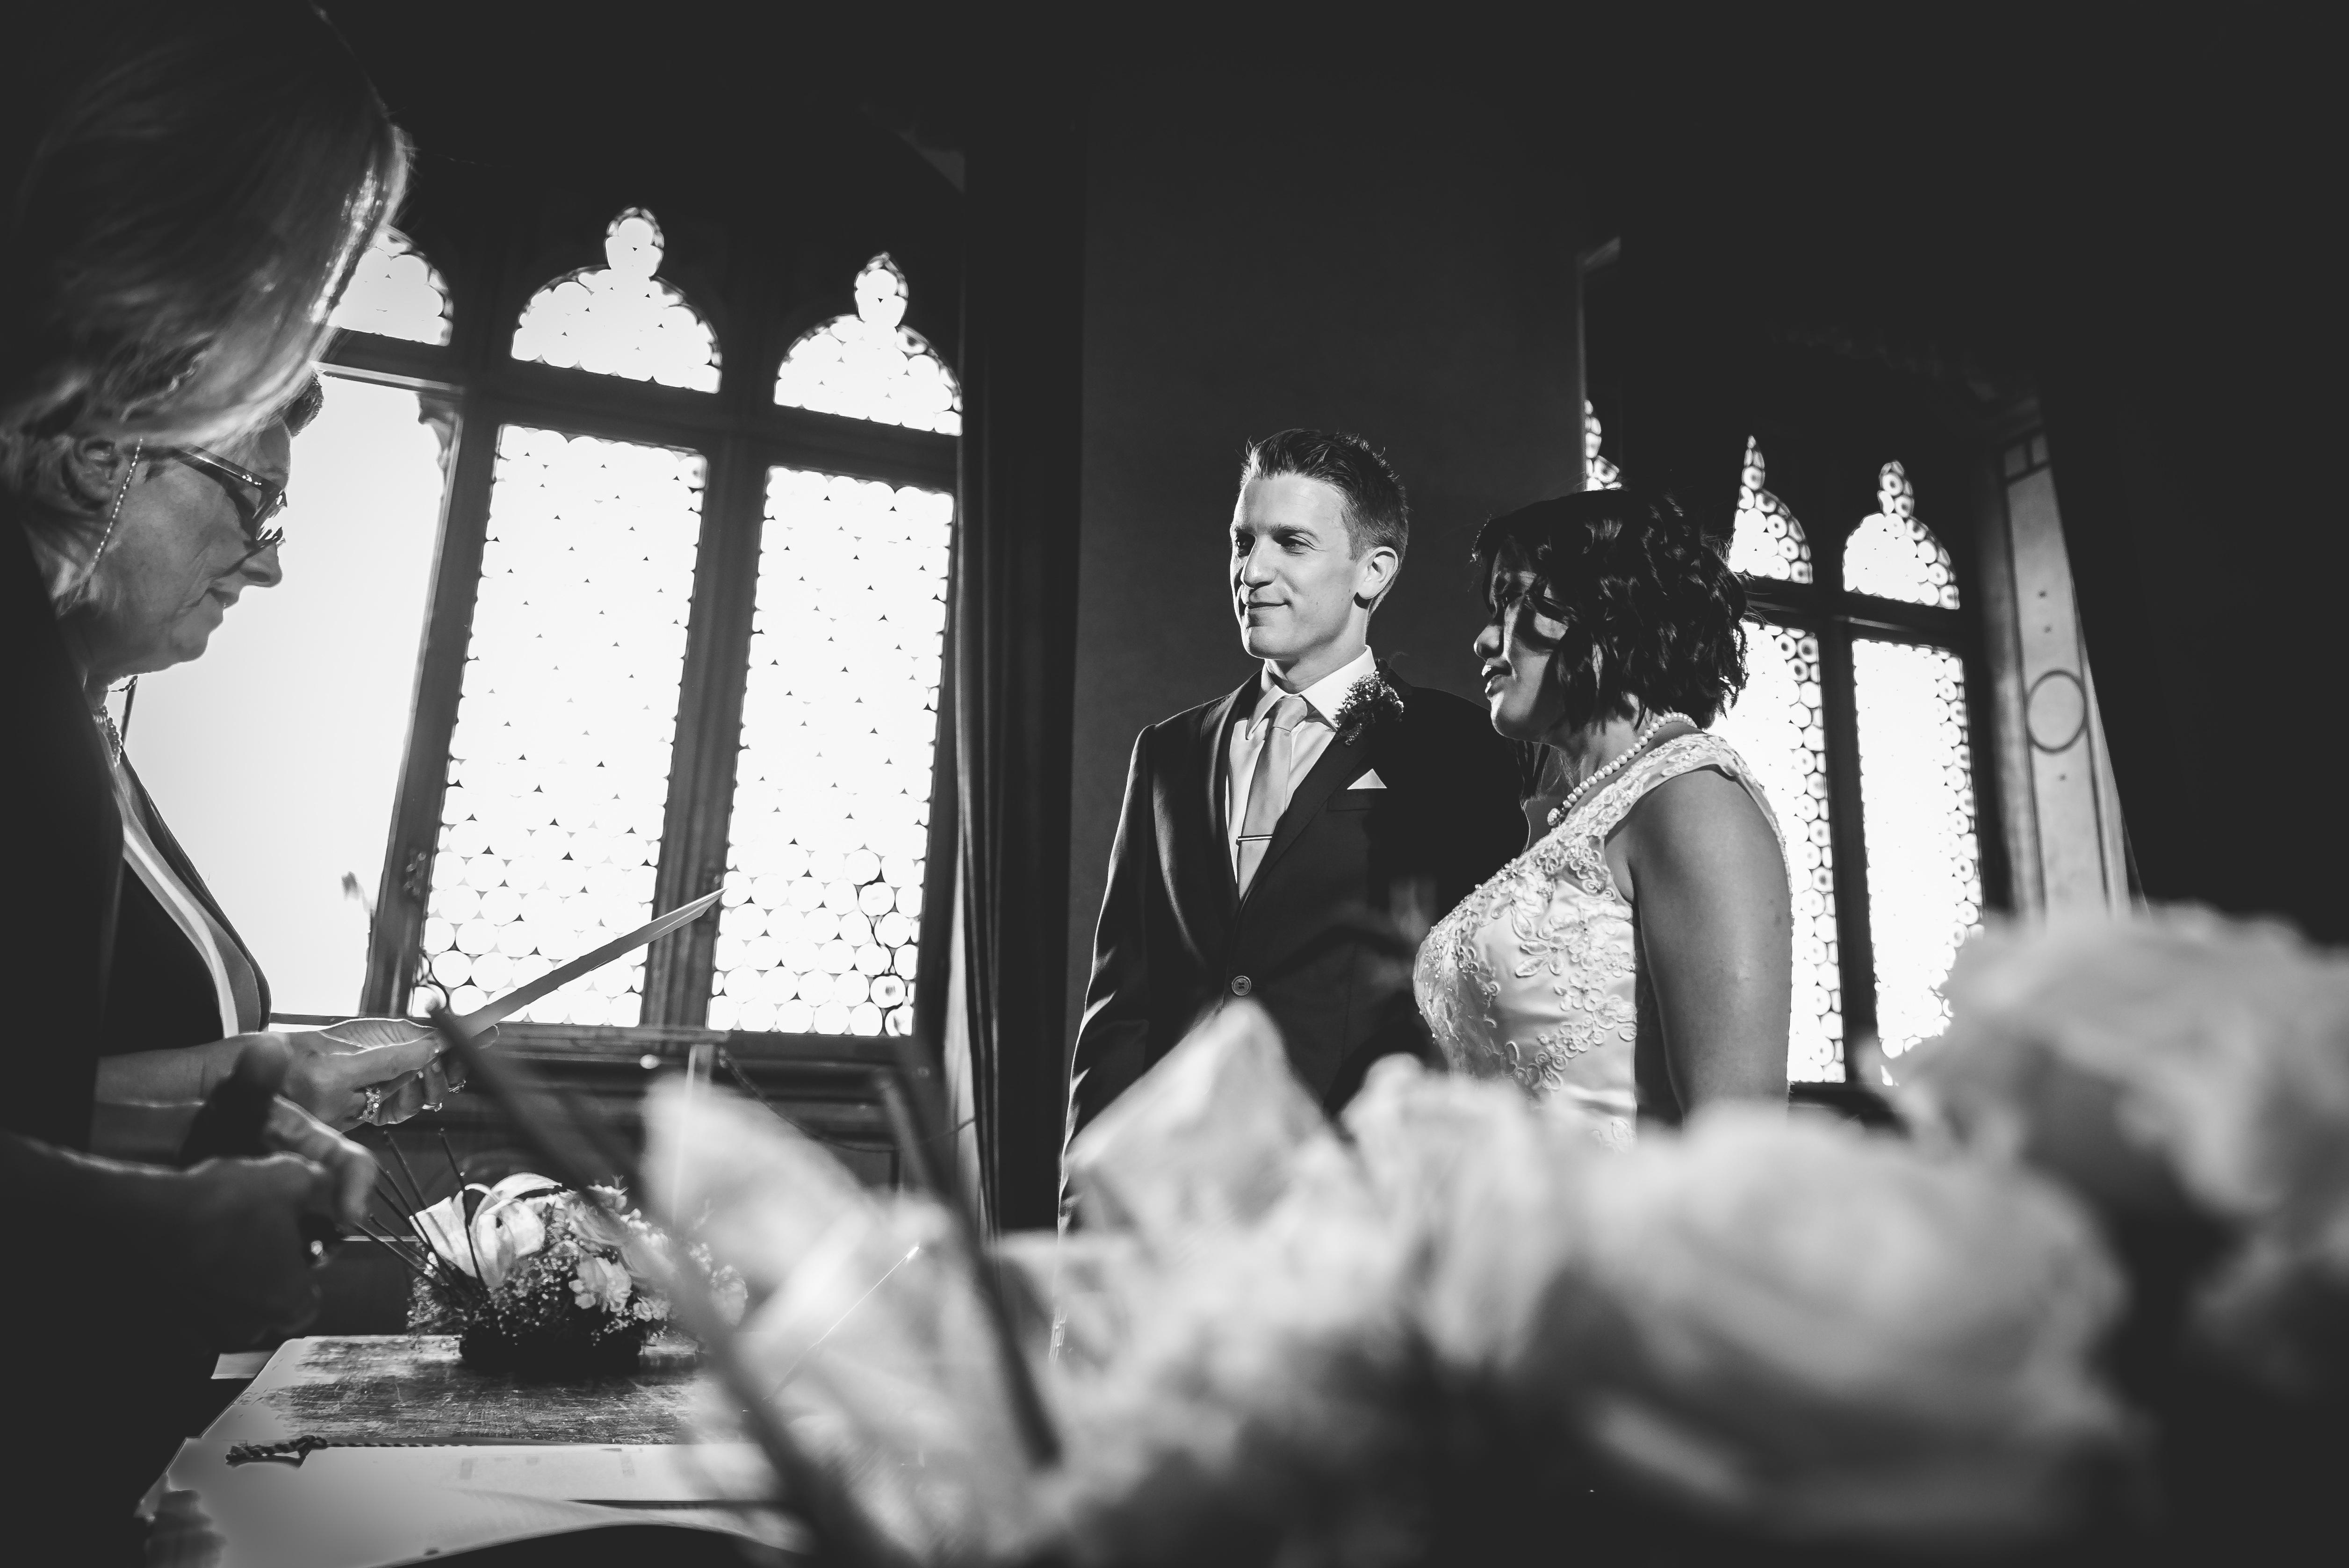 Argentieri Anthony Wedding Photographer_-161